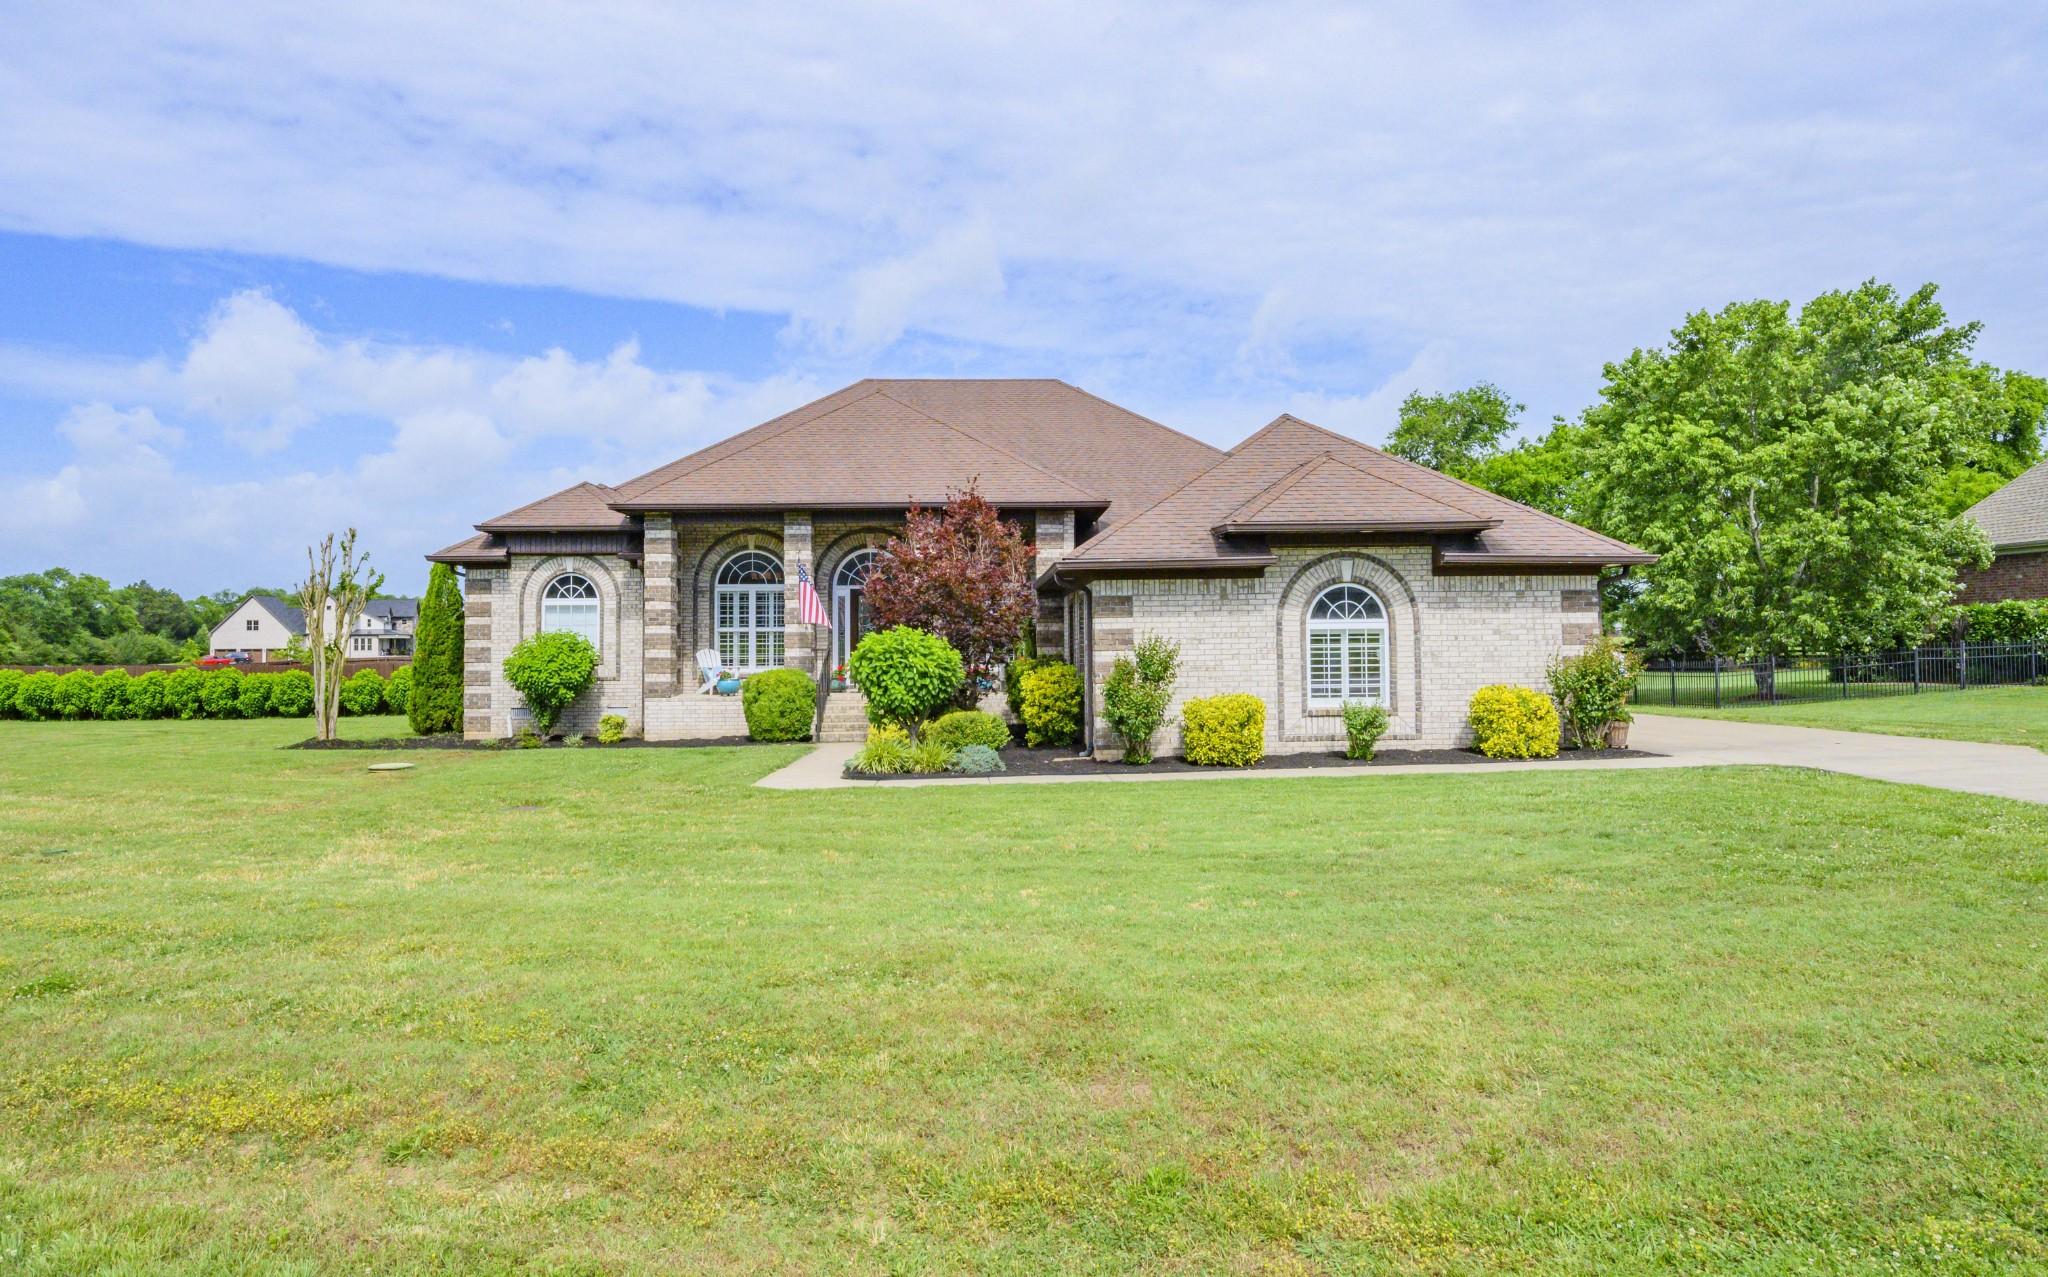 3865 Triple Crown Dr Property Photo - Murfreesboro, TN real estate listing